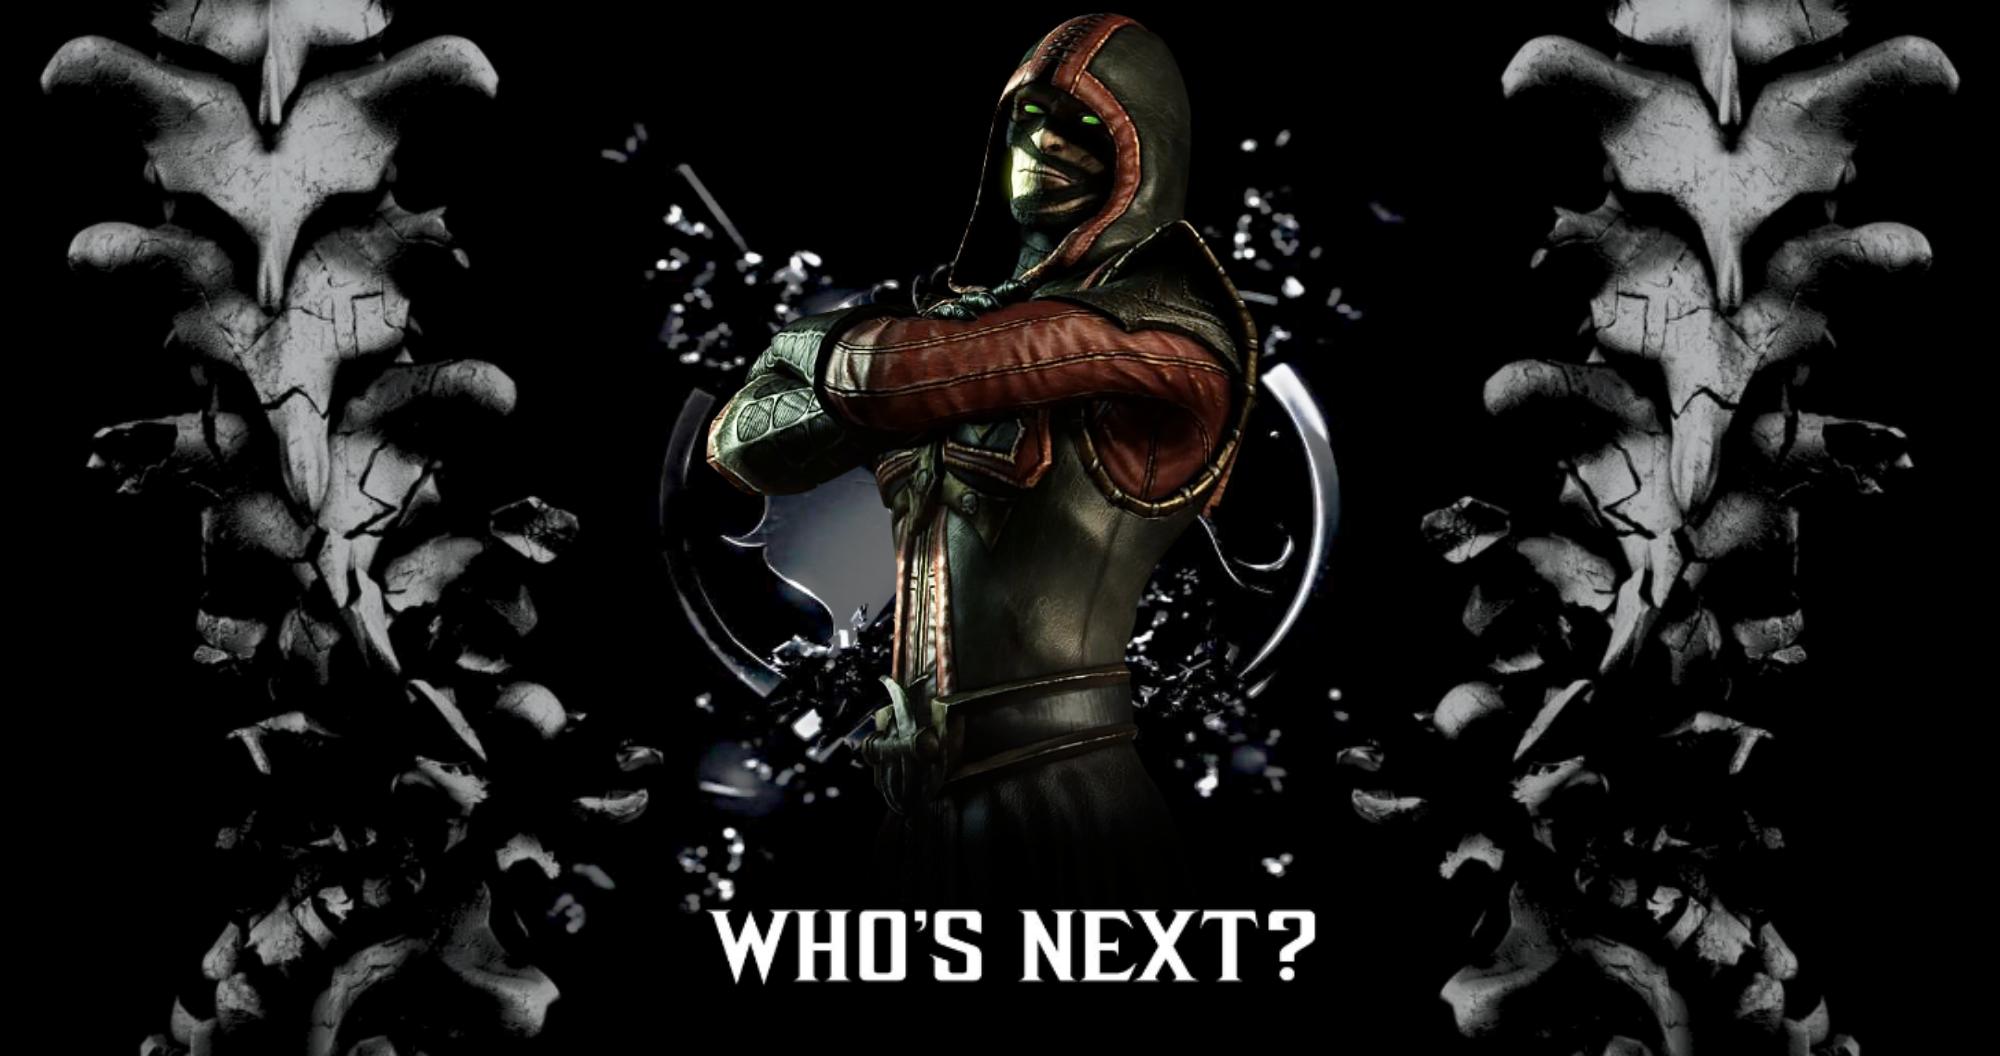 Ermac Wallpapers Hd Mortal Kombat Mortal Kombat X Mortal Kombat